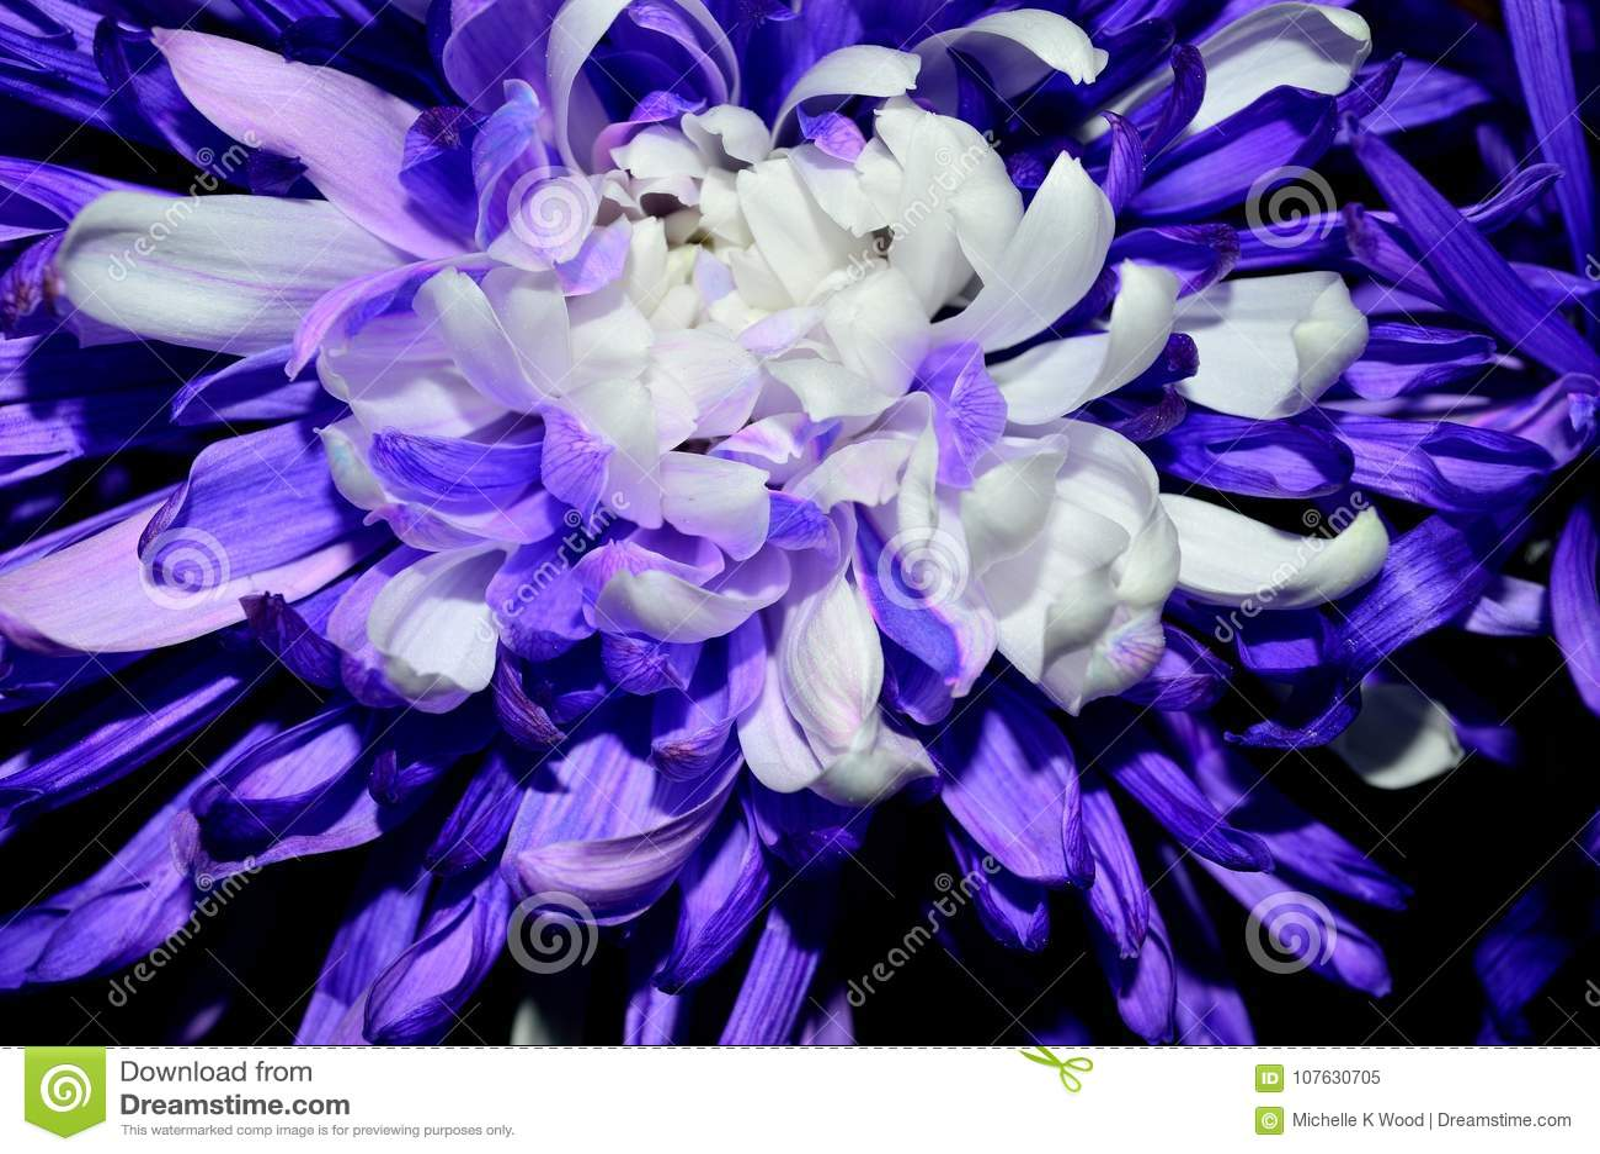 Closeup purple with white centered dahlia